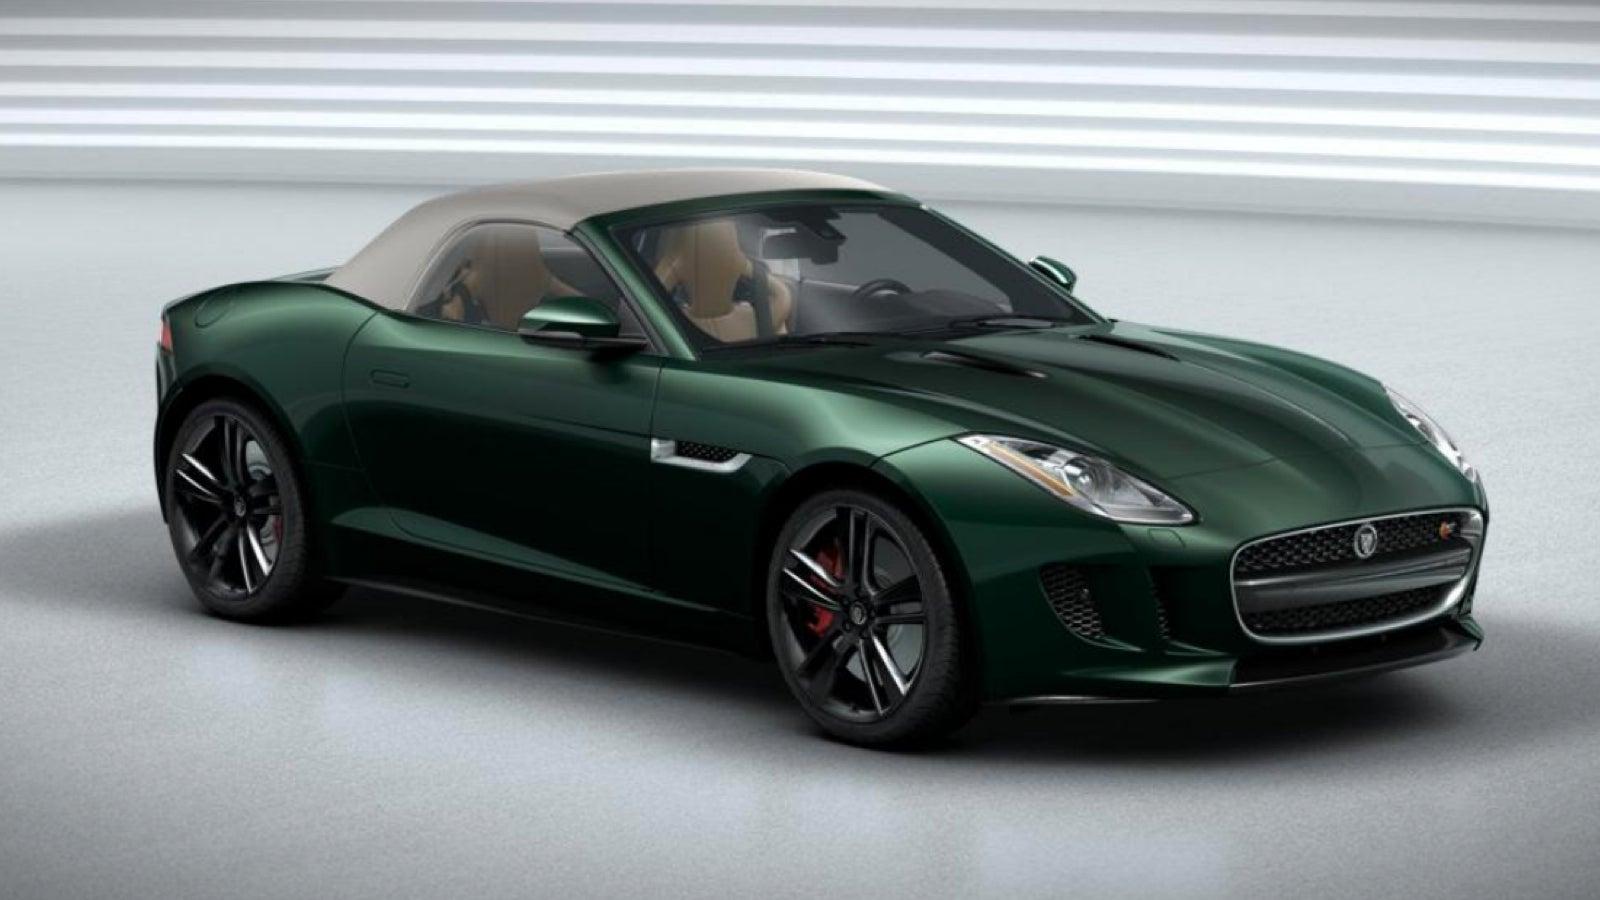 jaguar f type green - photo #44